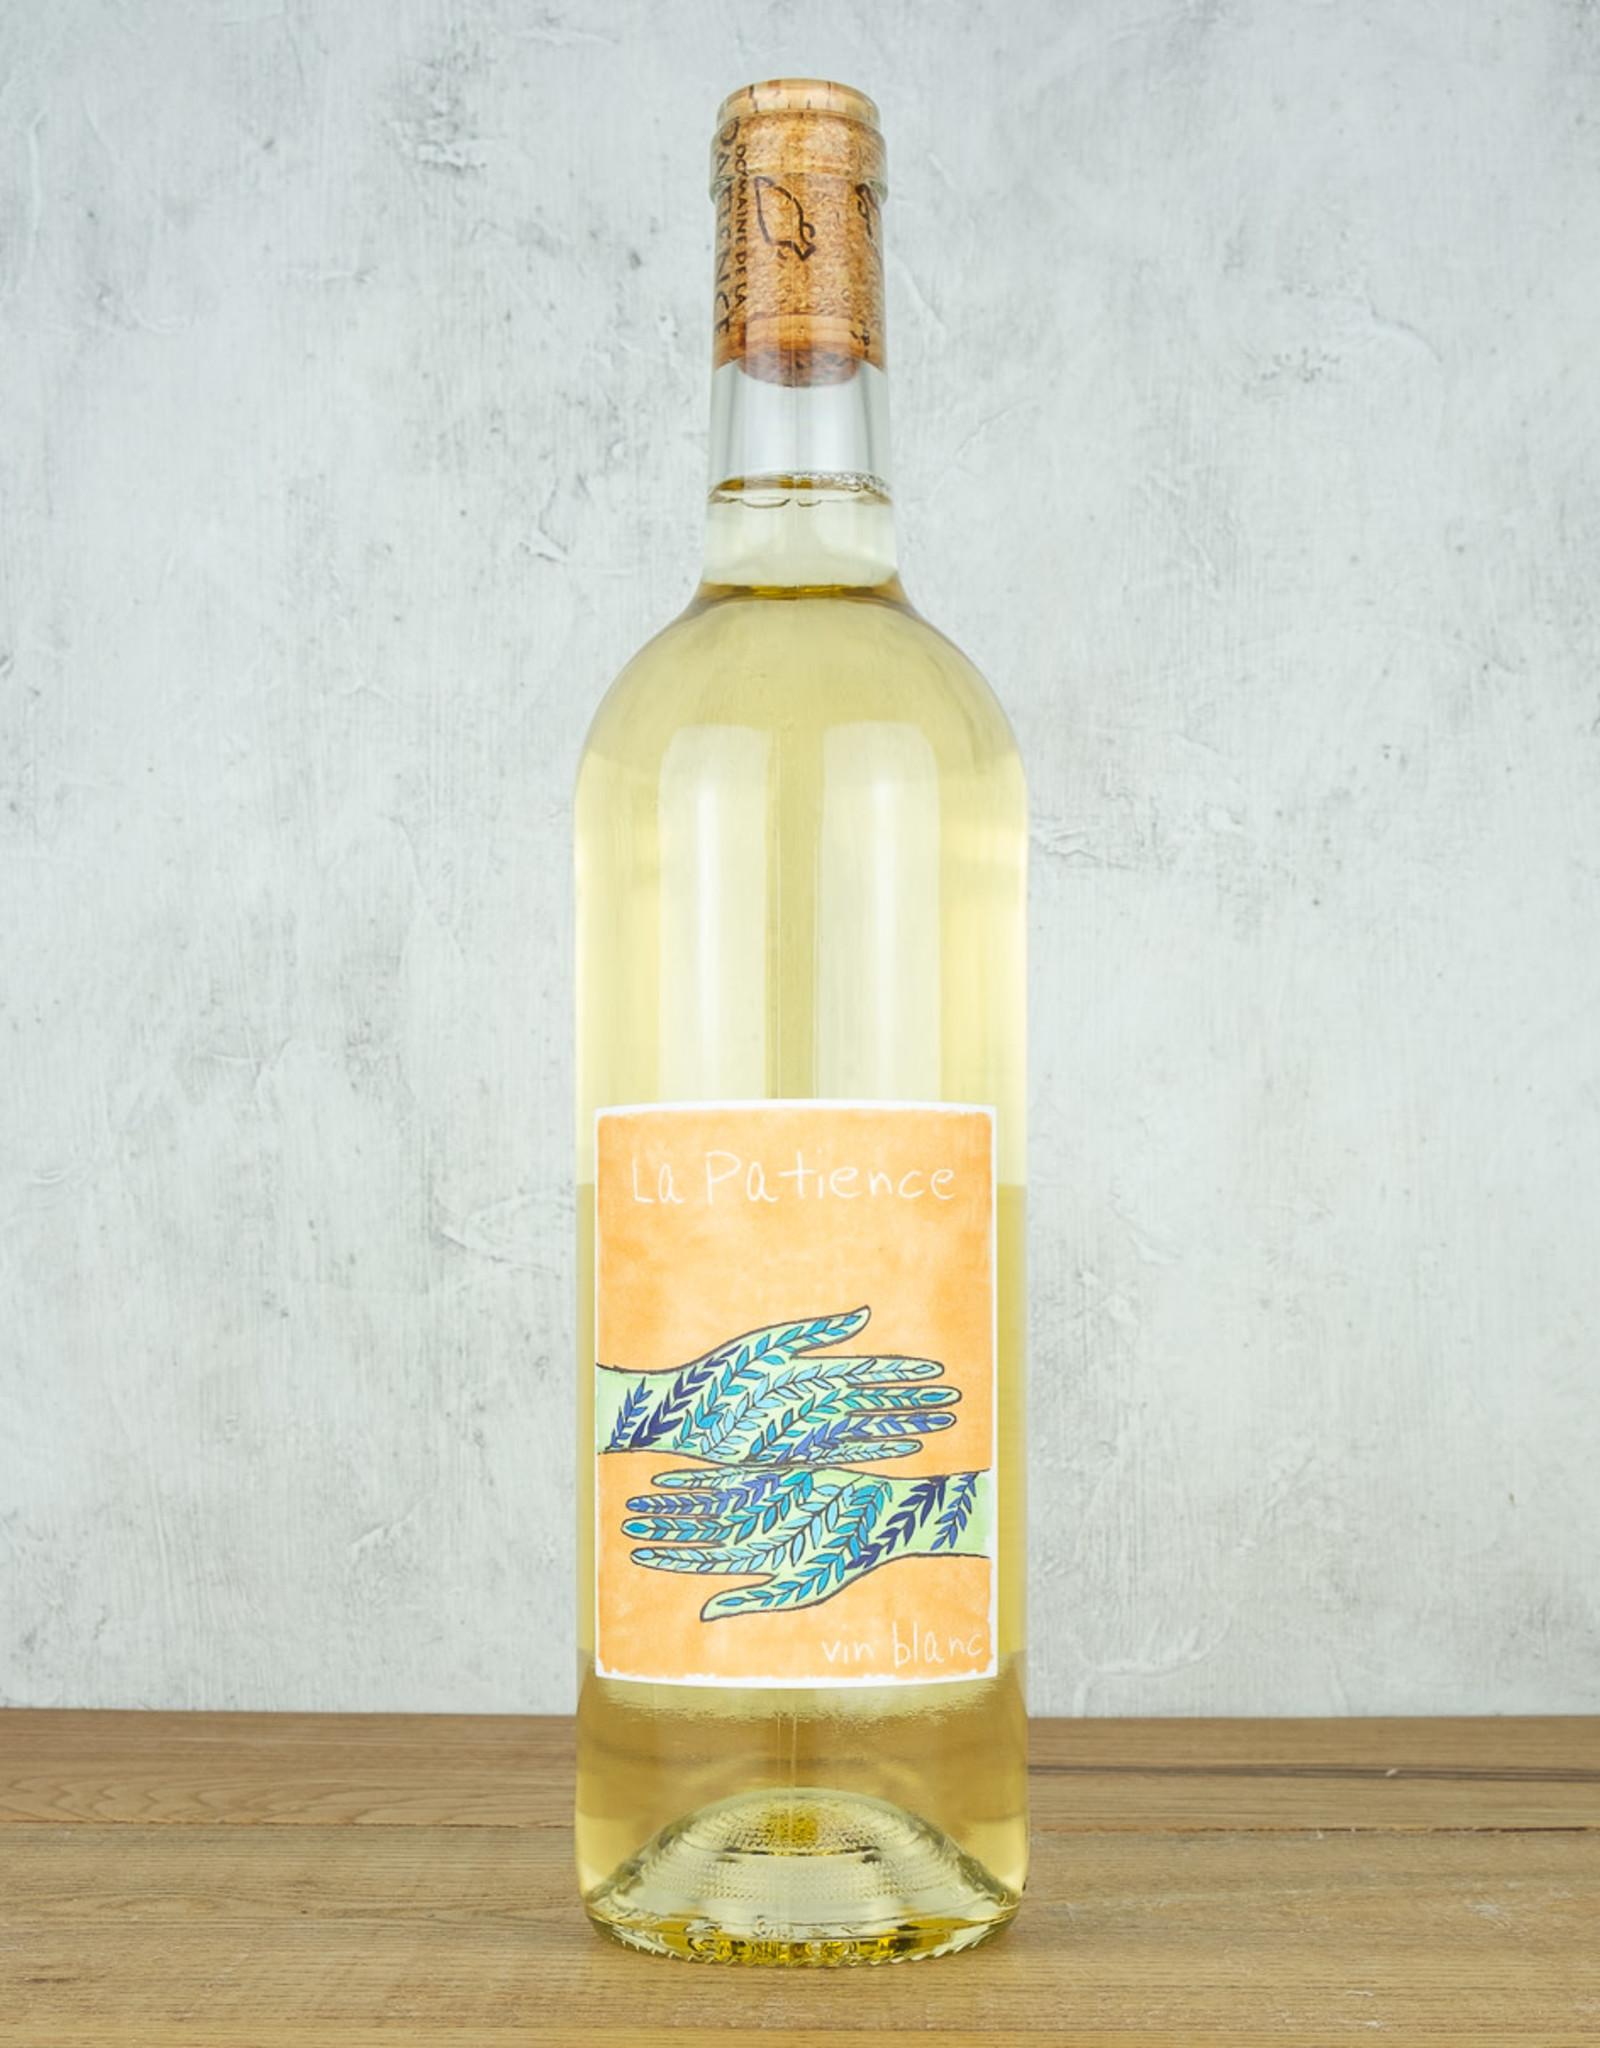 La Patience Vin Blanc